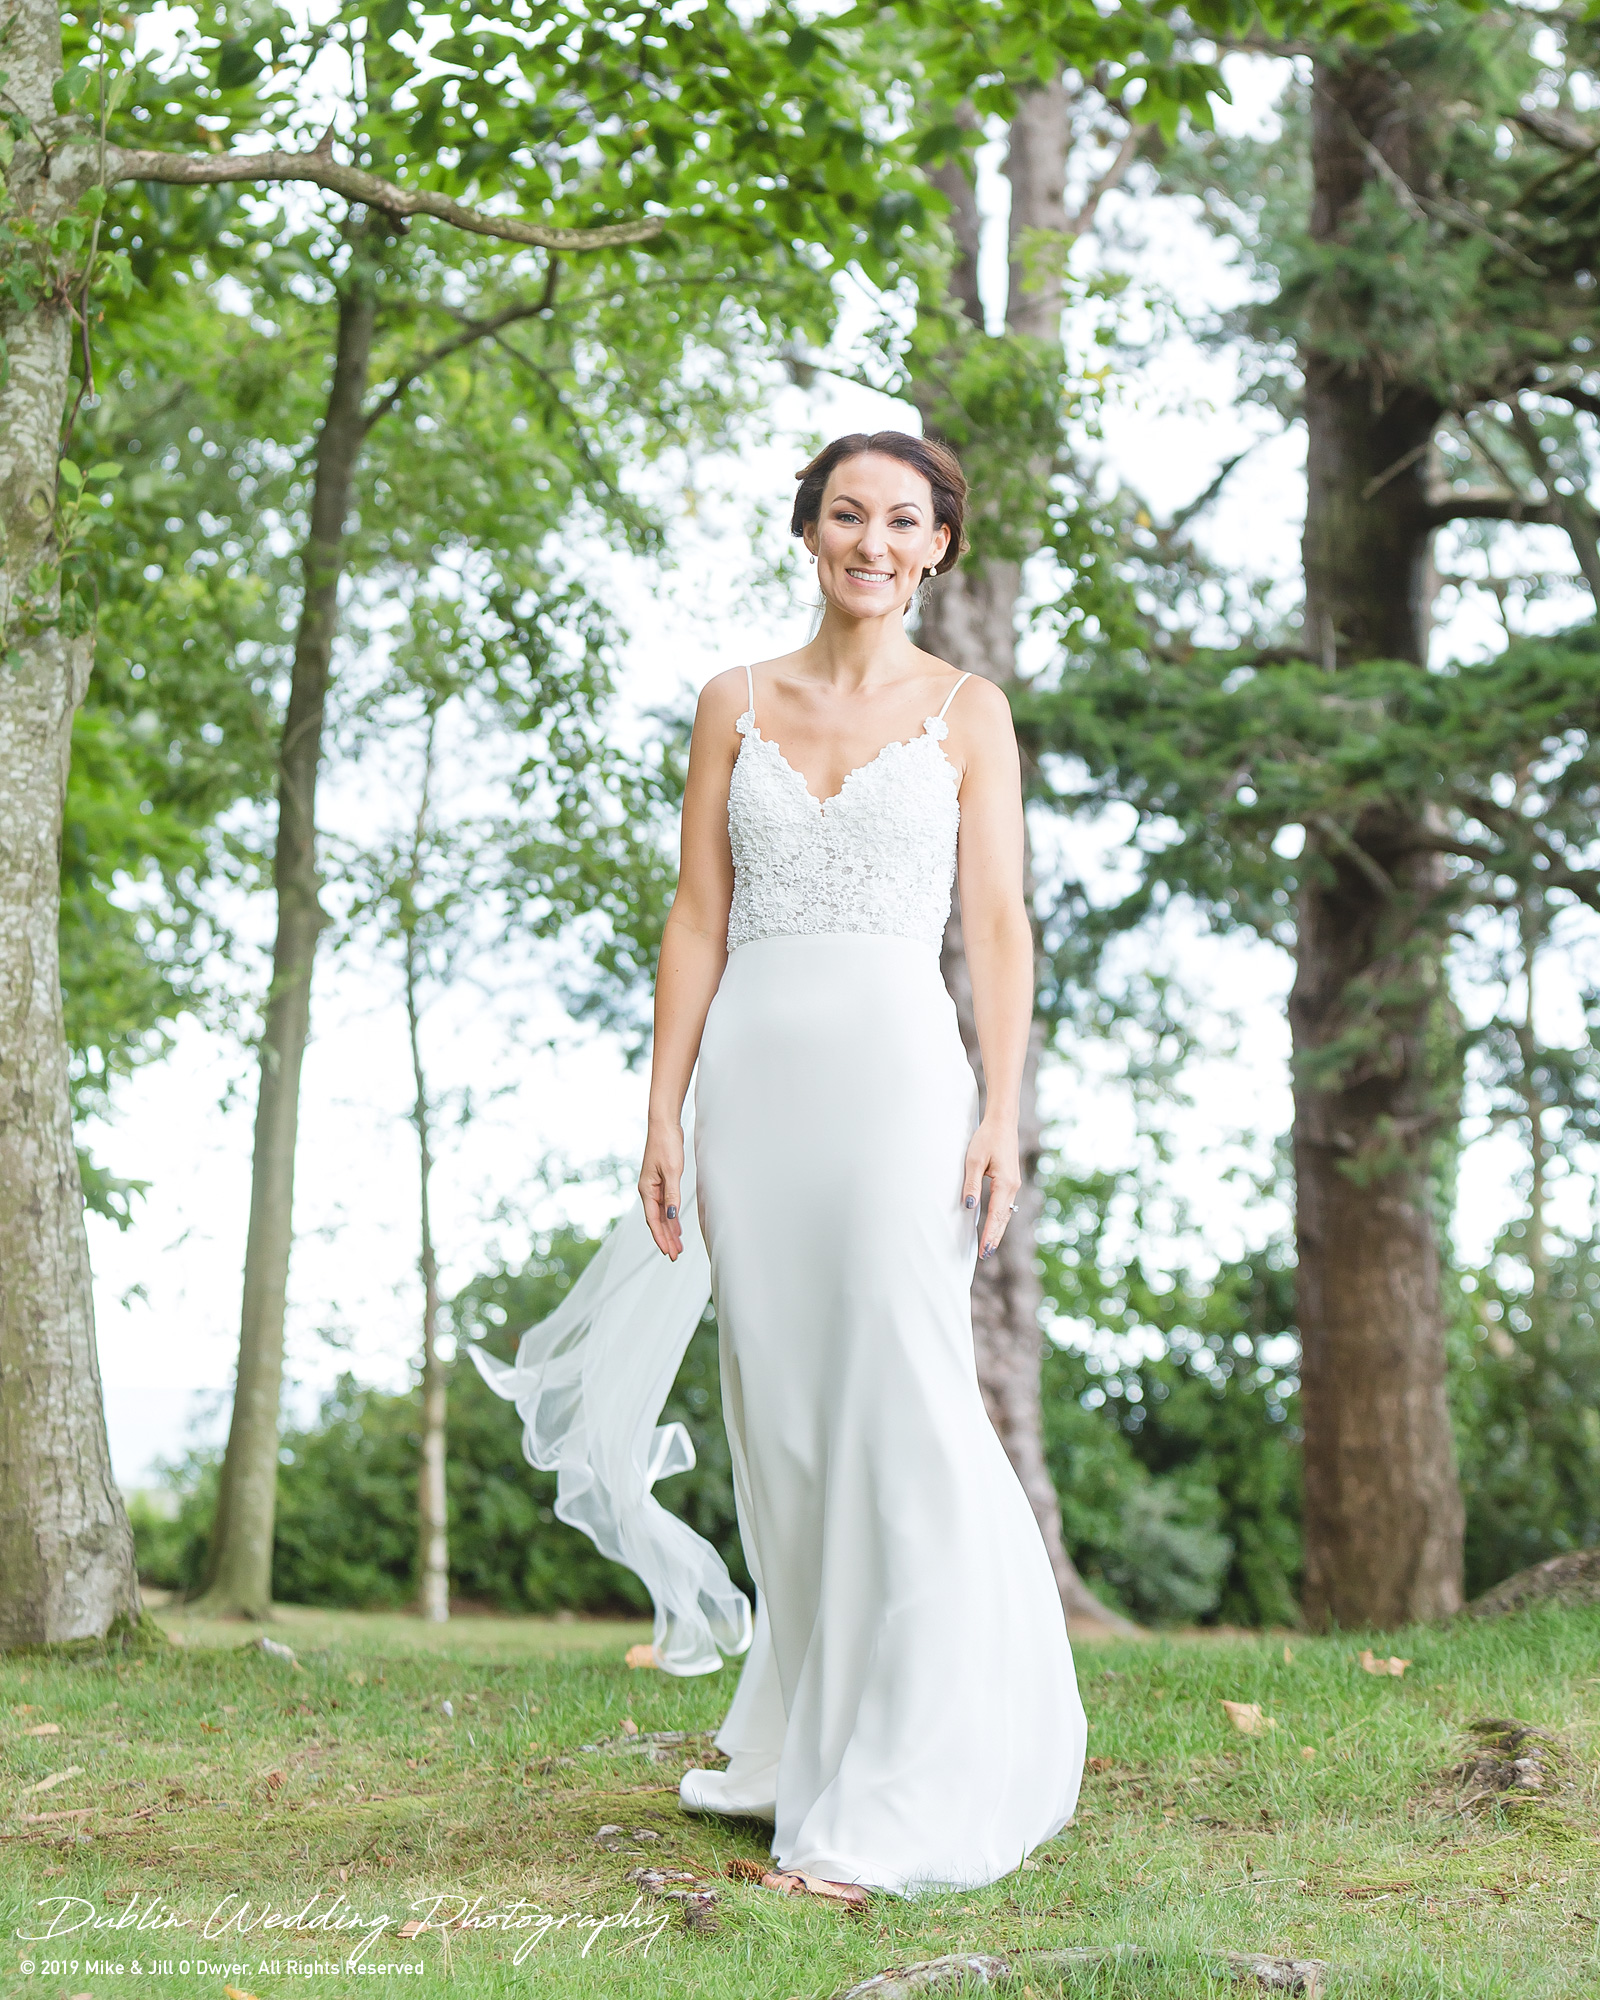 wedding-photographers-wicklow-tinakilly-house-2019-35.jpg